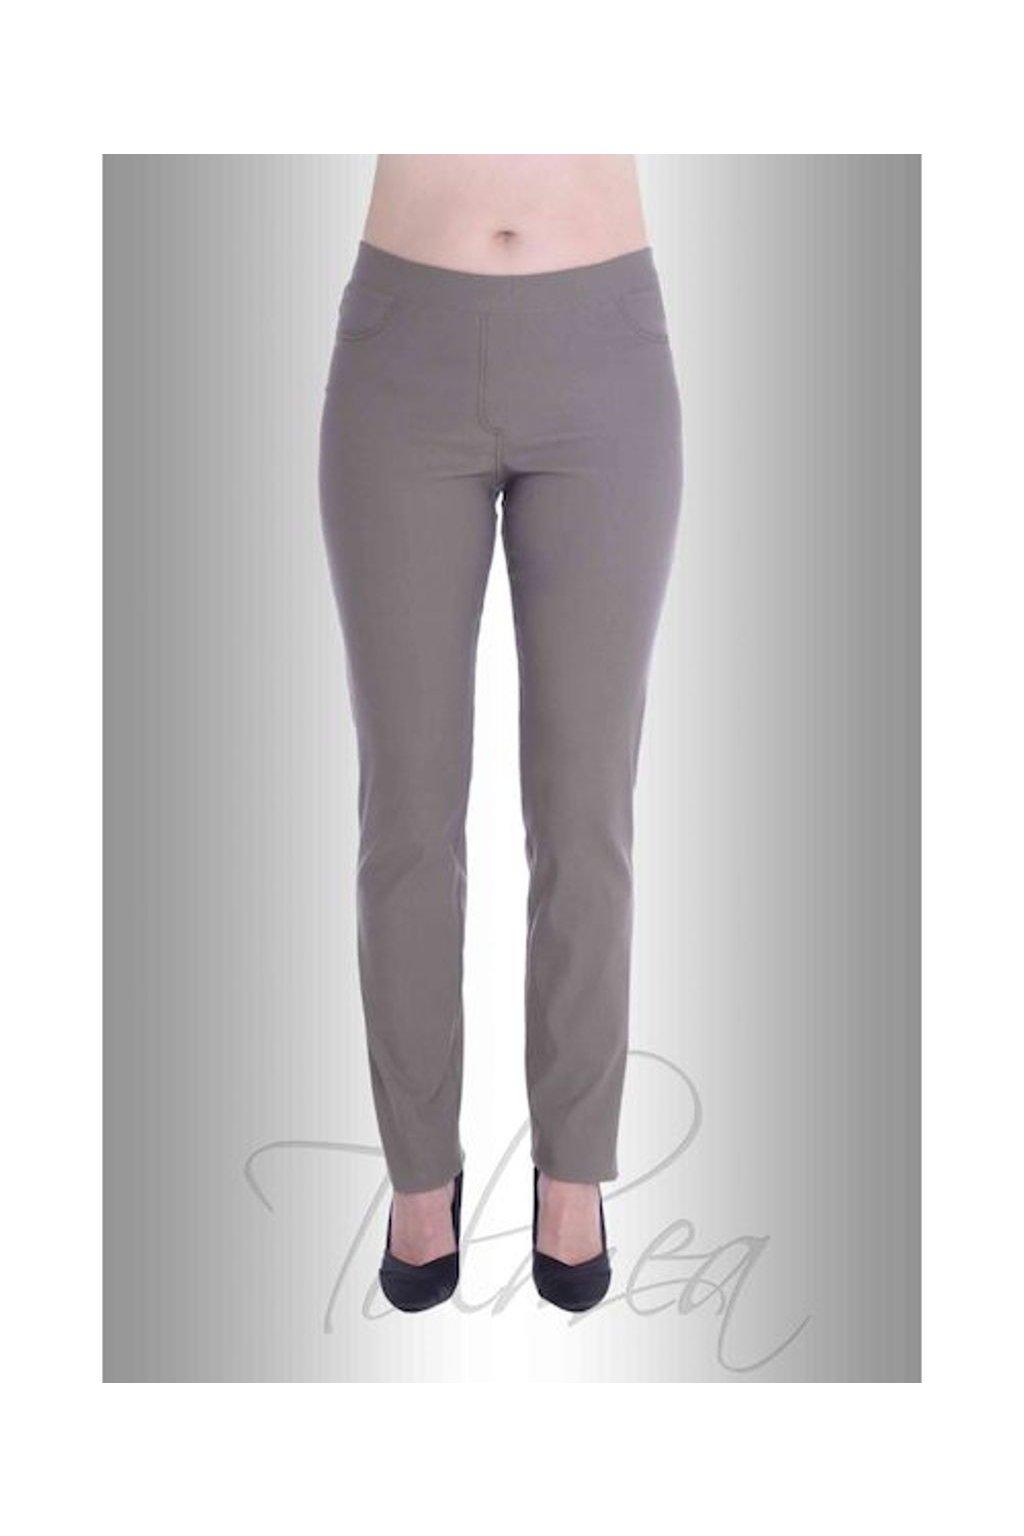 Kalhoty elastické džegíny 51T (Velikost 36, Barva Béžová tmavá)